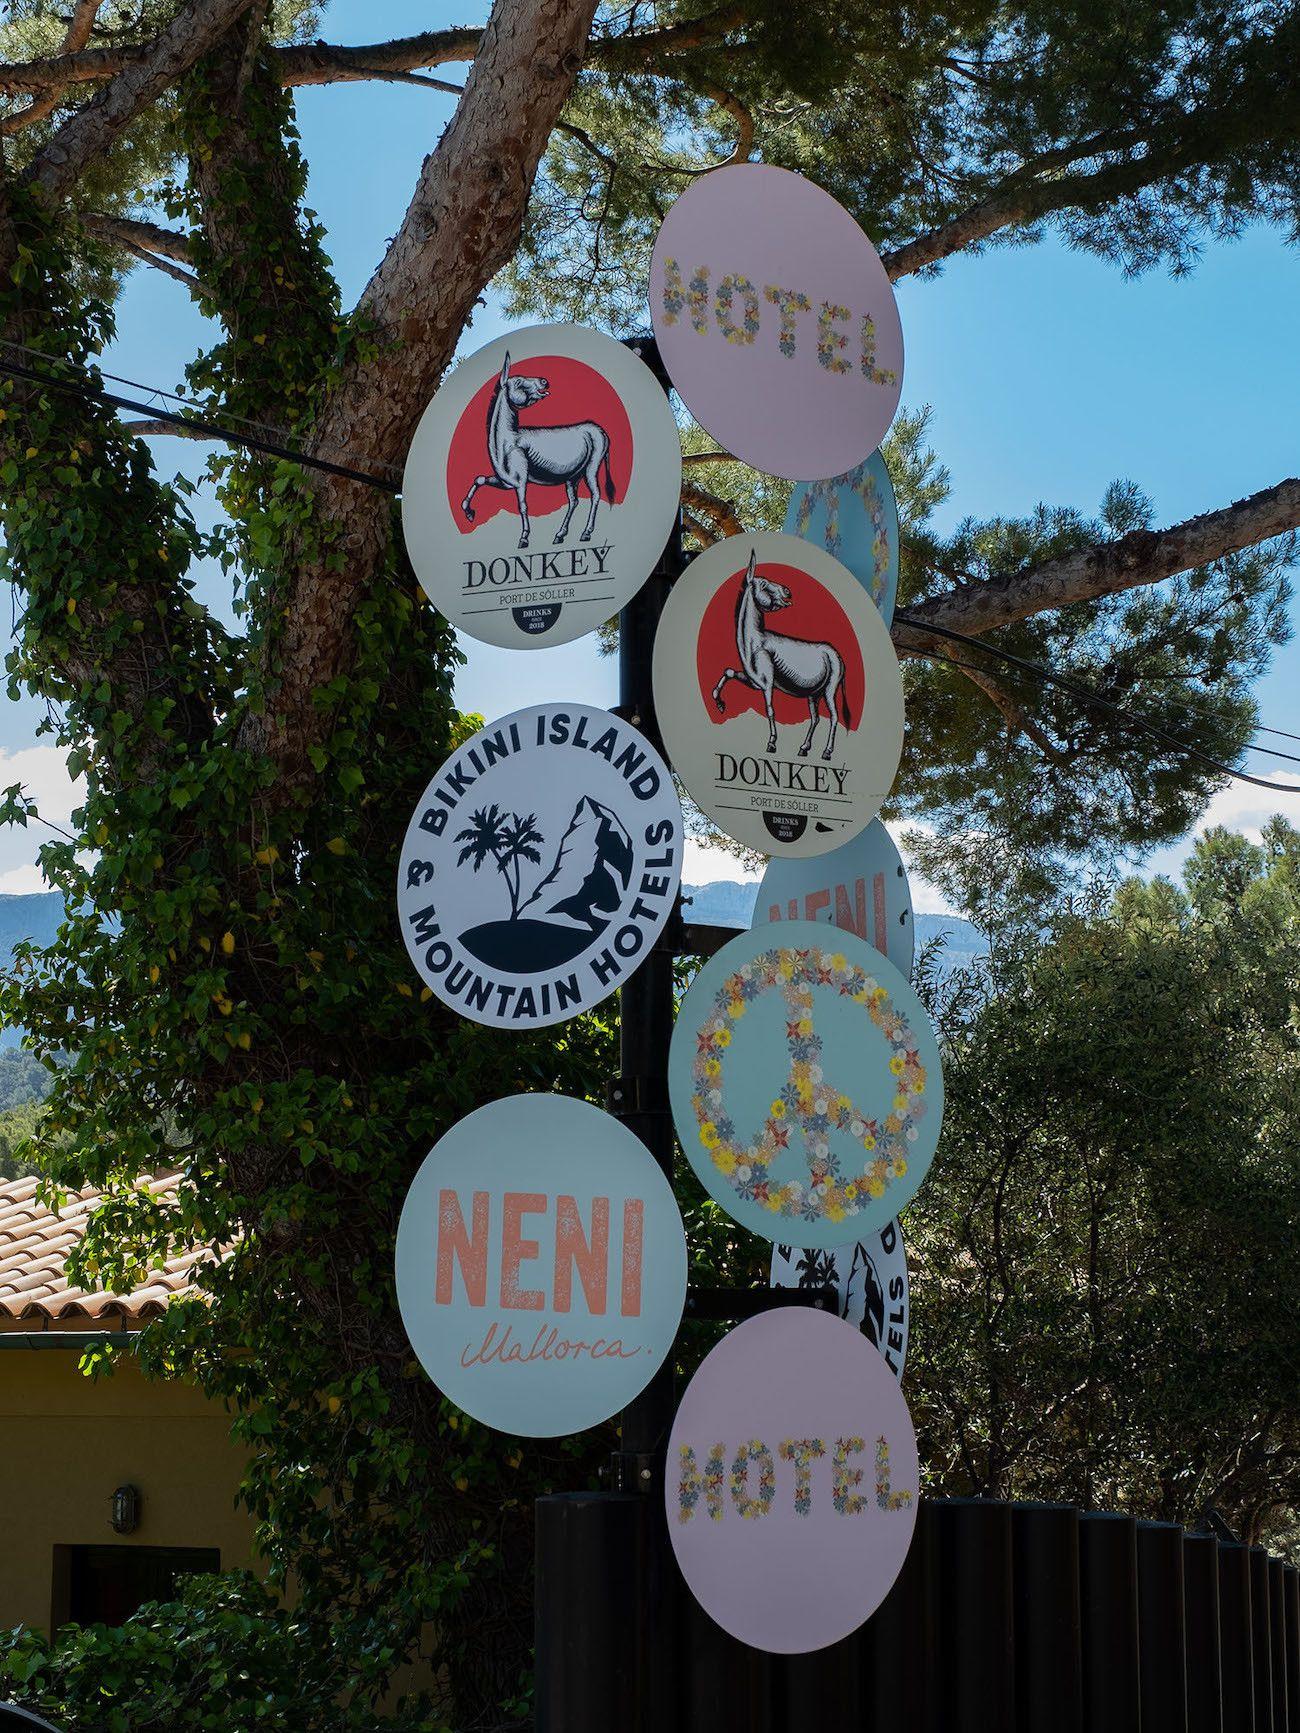 Foodblog About Fuel, Bikini Island & Mountain Hotels, Schilder